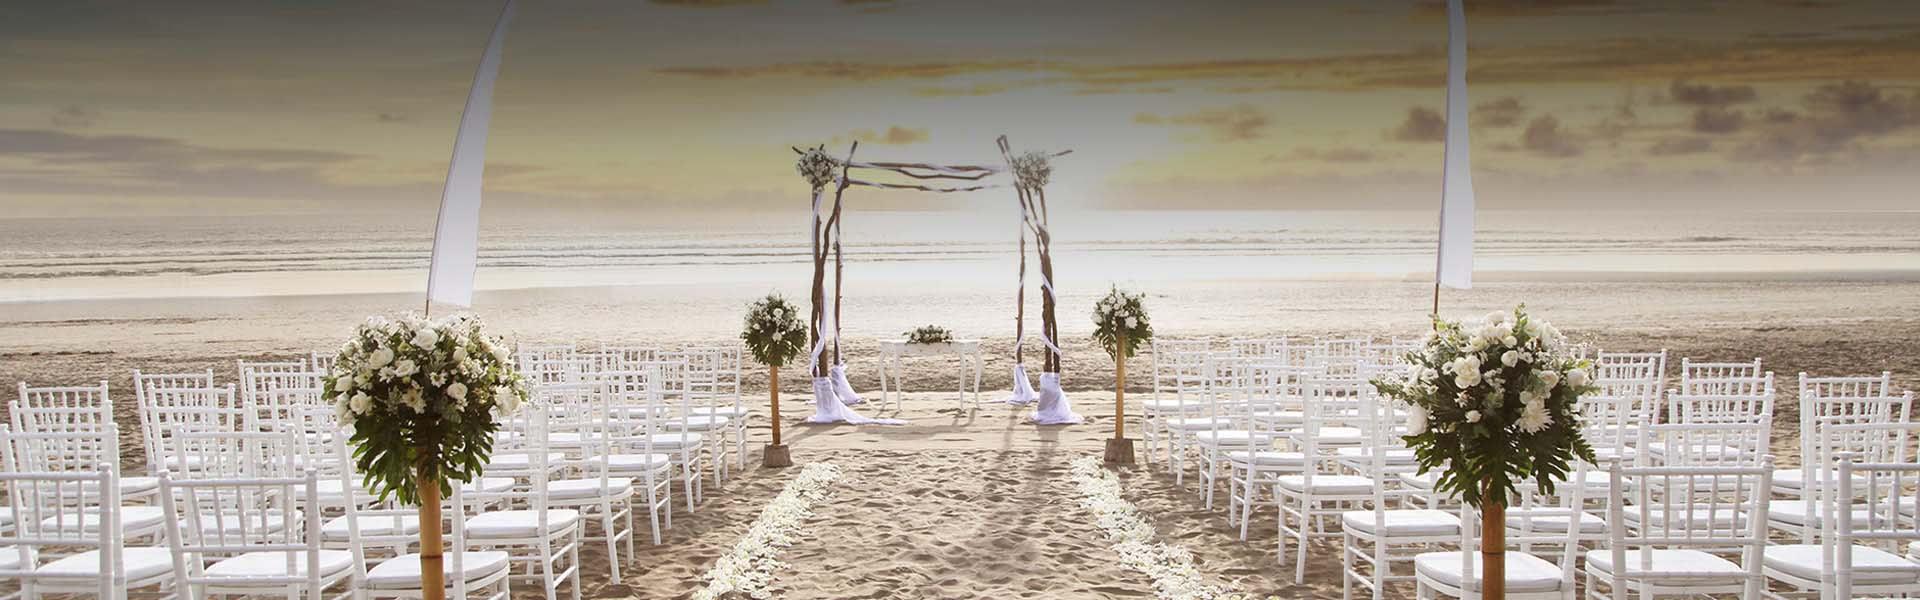 Weddings At Anantara Seminyak Bali